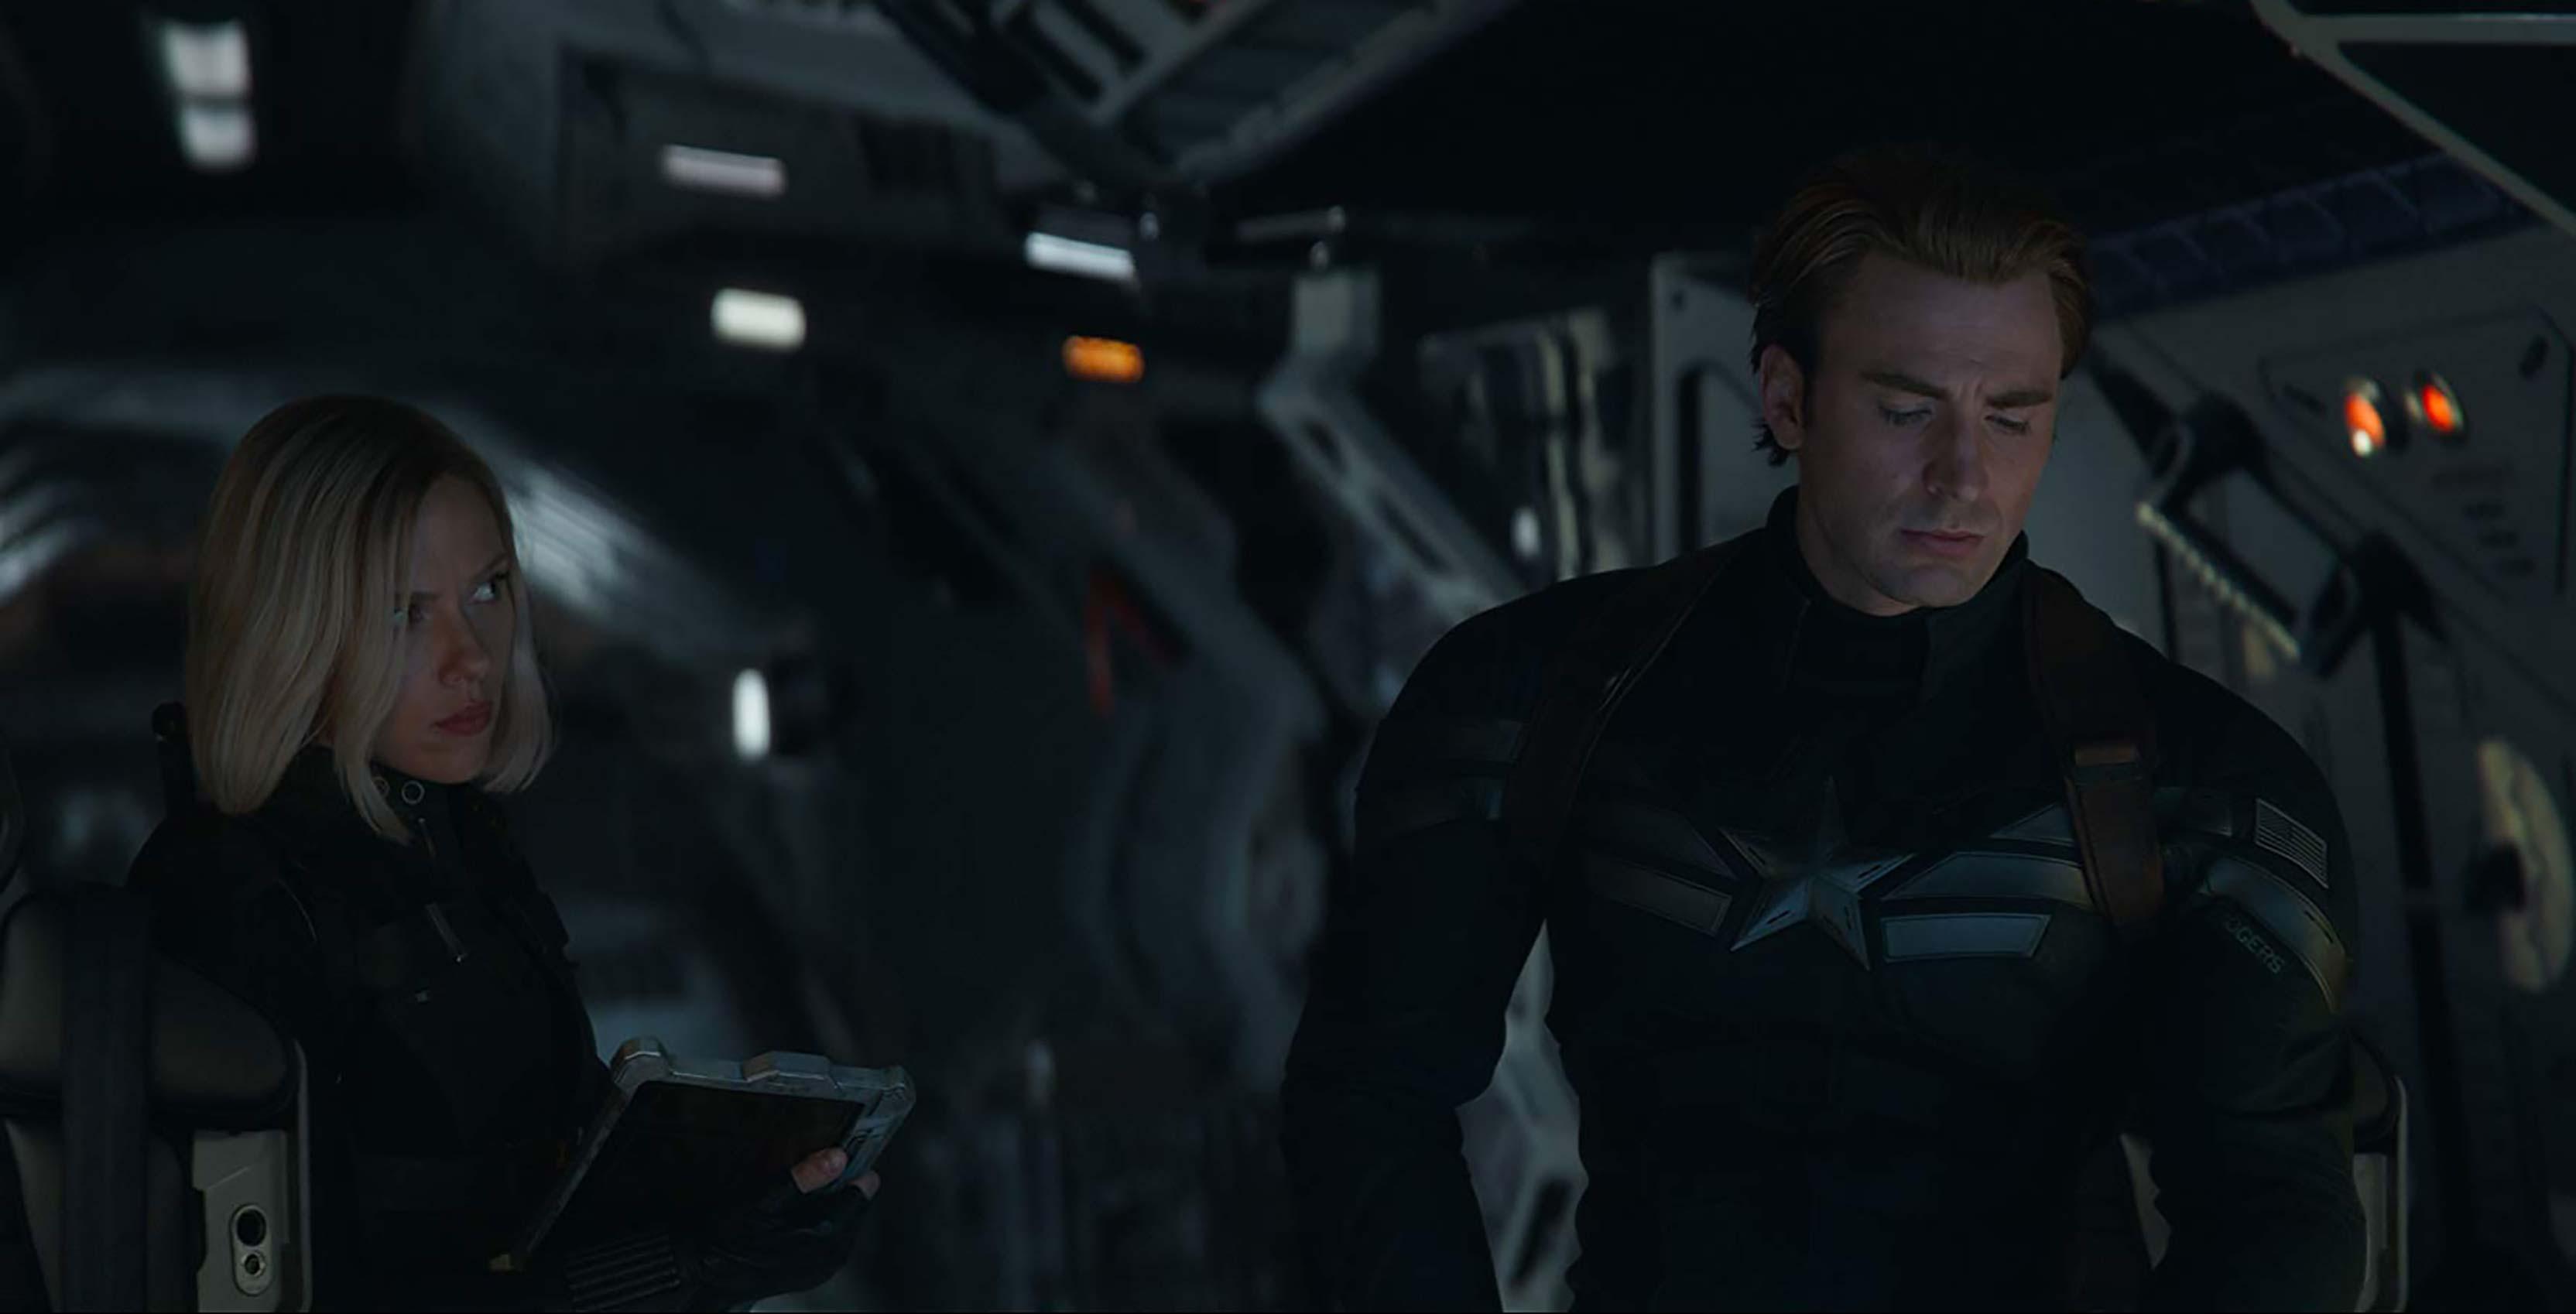 Avengers: Endgame Captain America and Black Widow